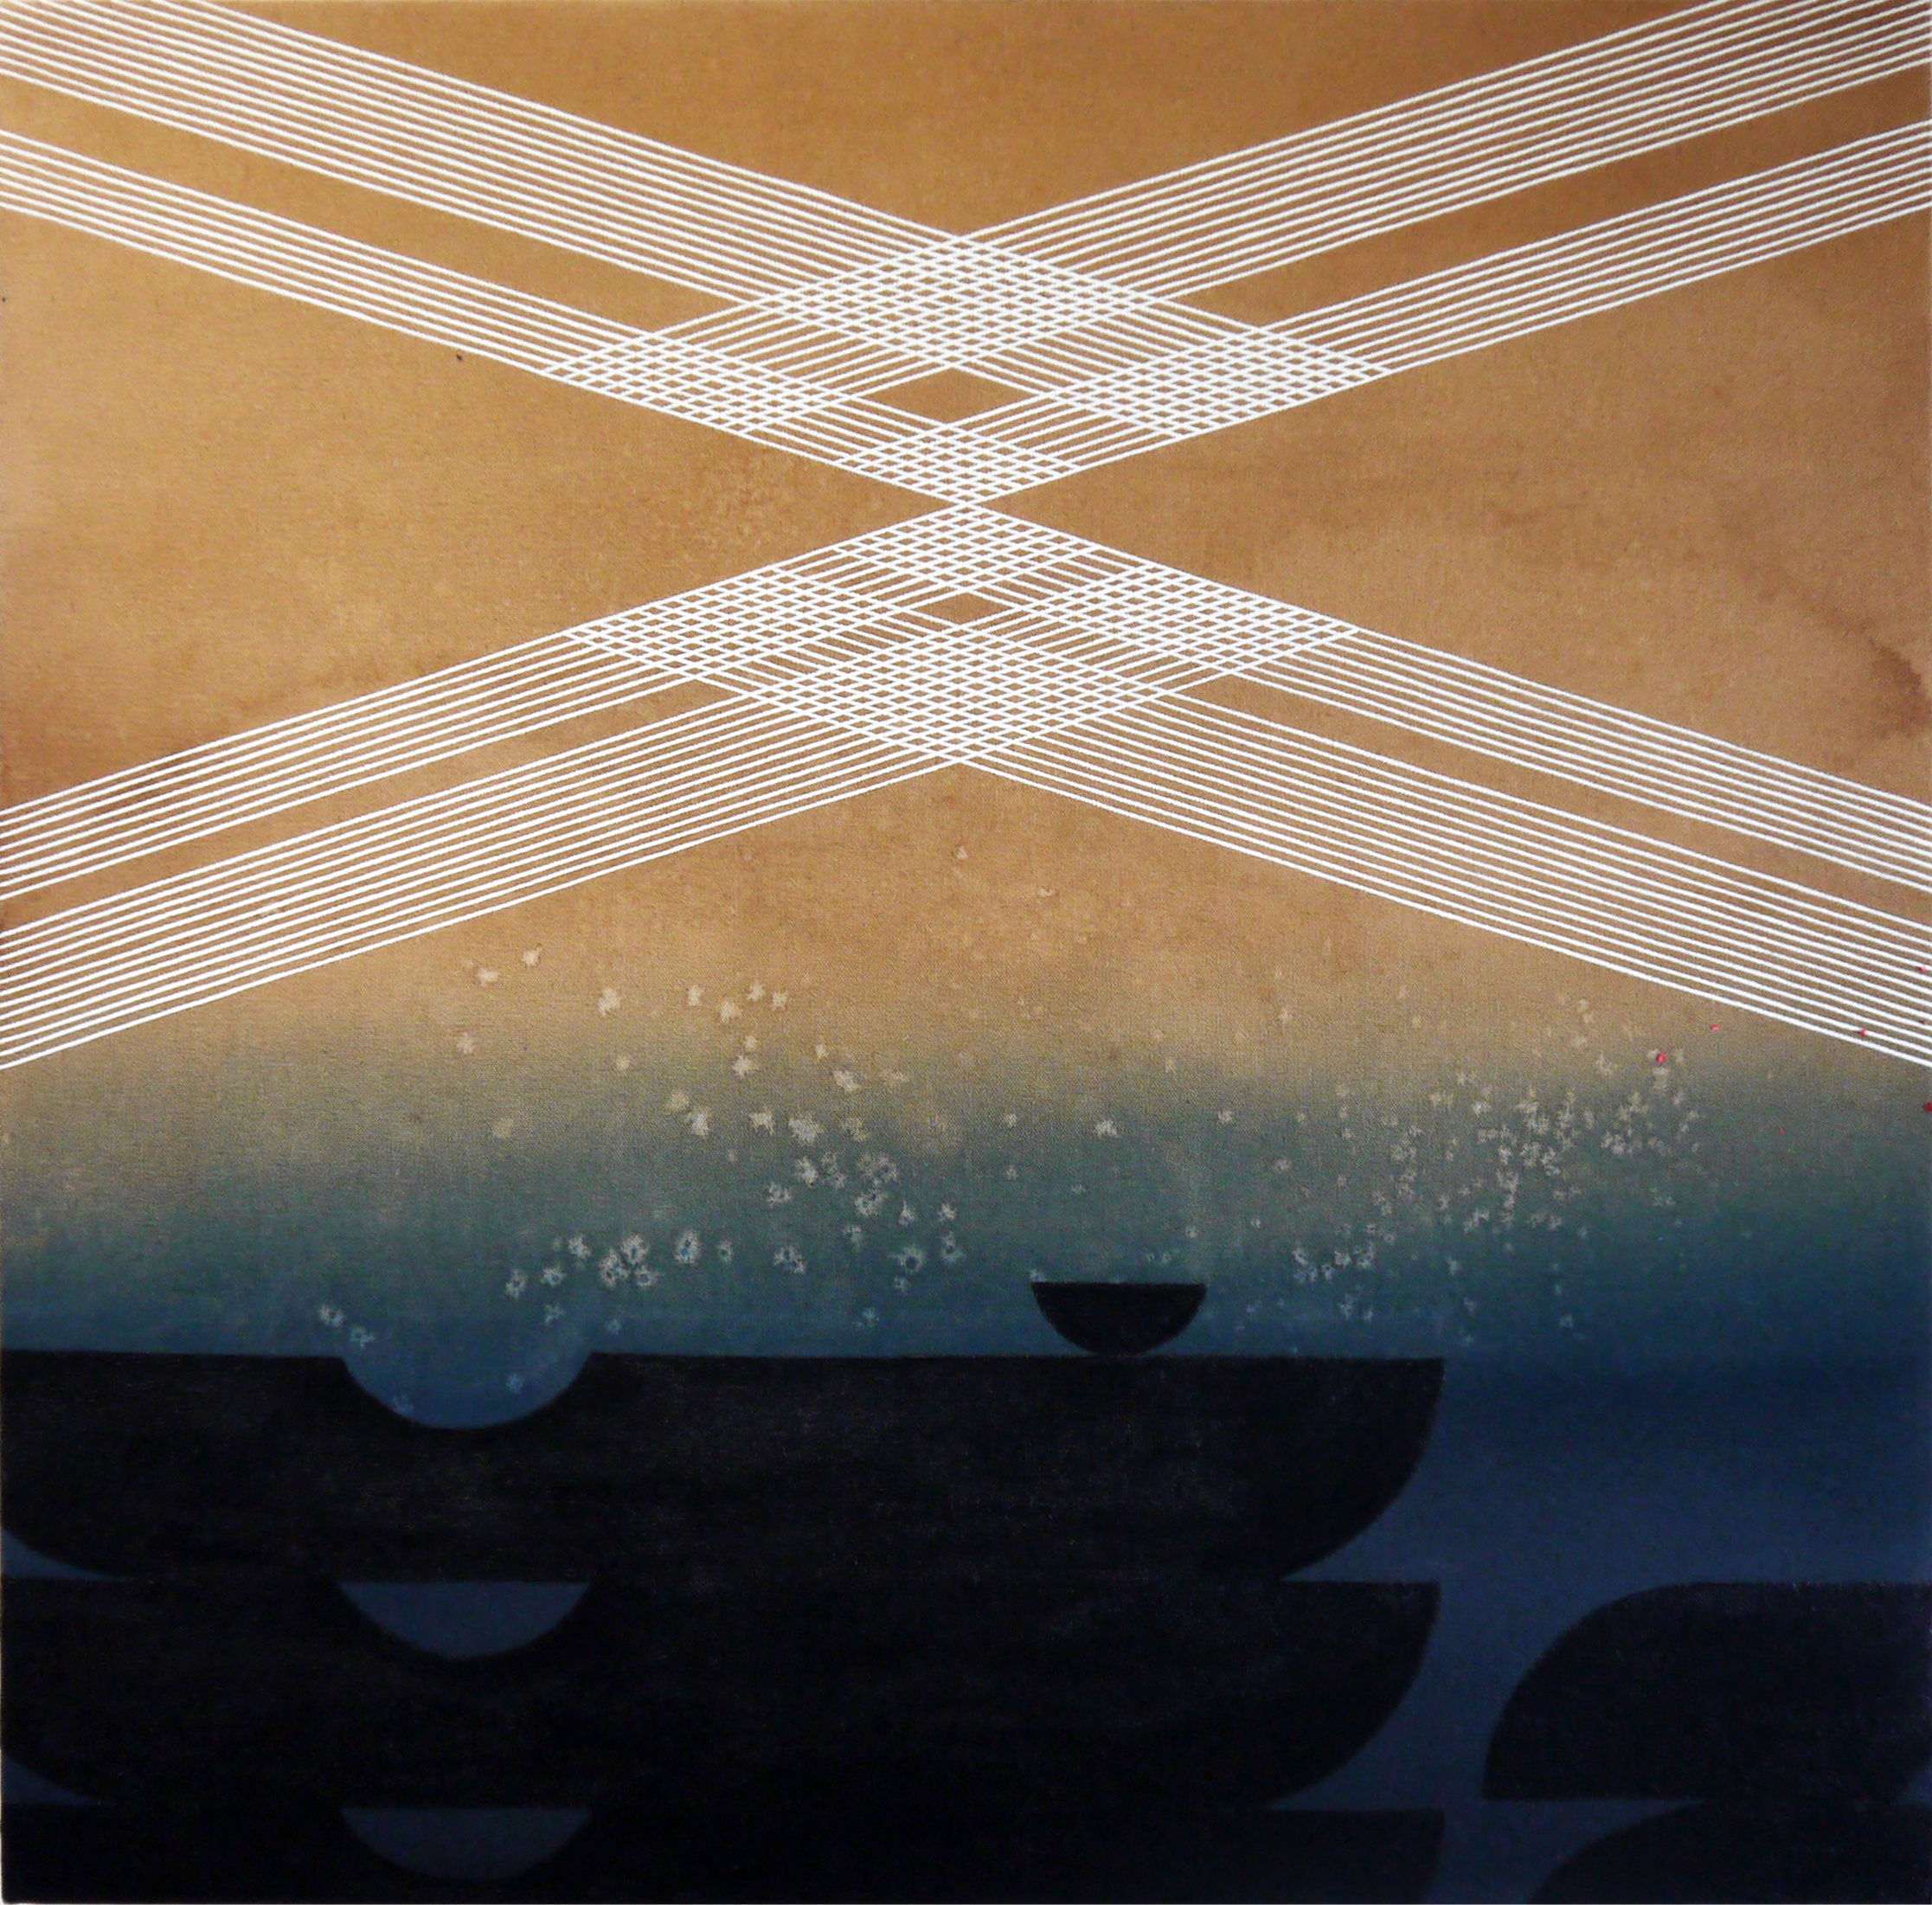 Kelly Ording_Kurofune_Acrylic on died canvas_30x30_2015 (1).JPG